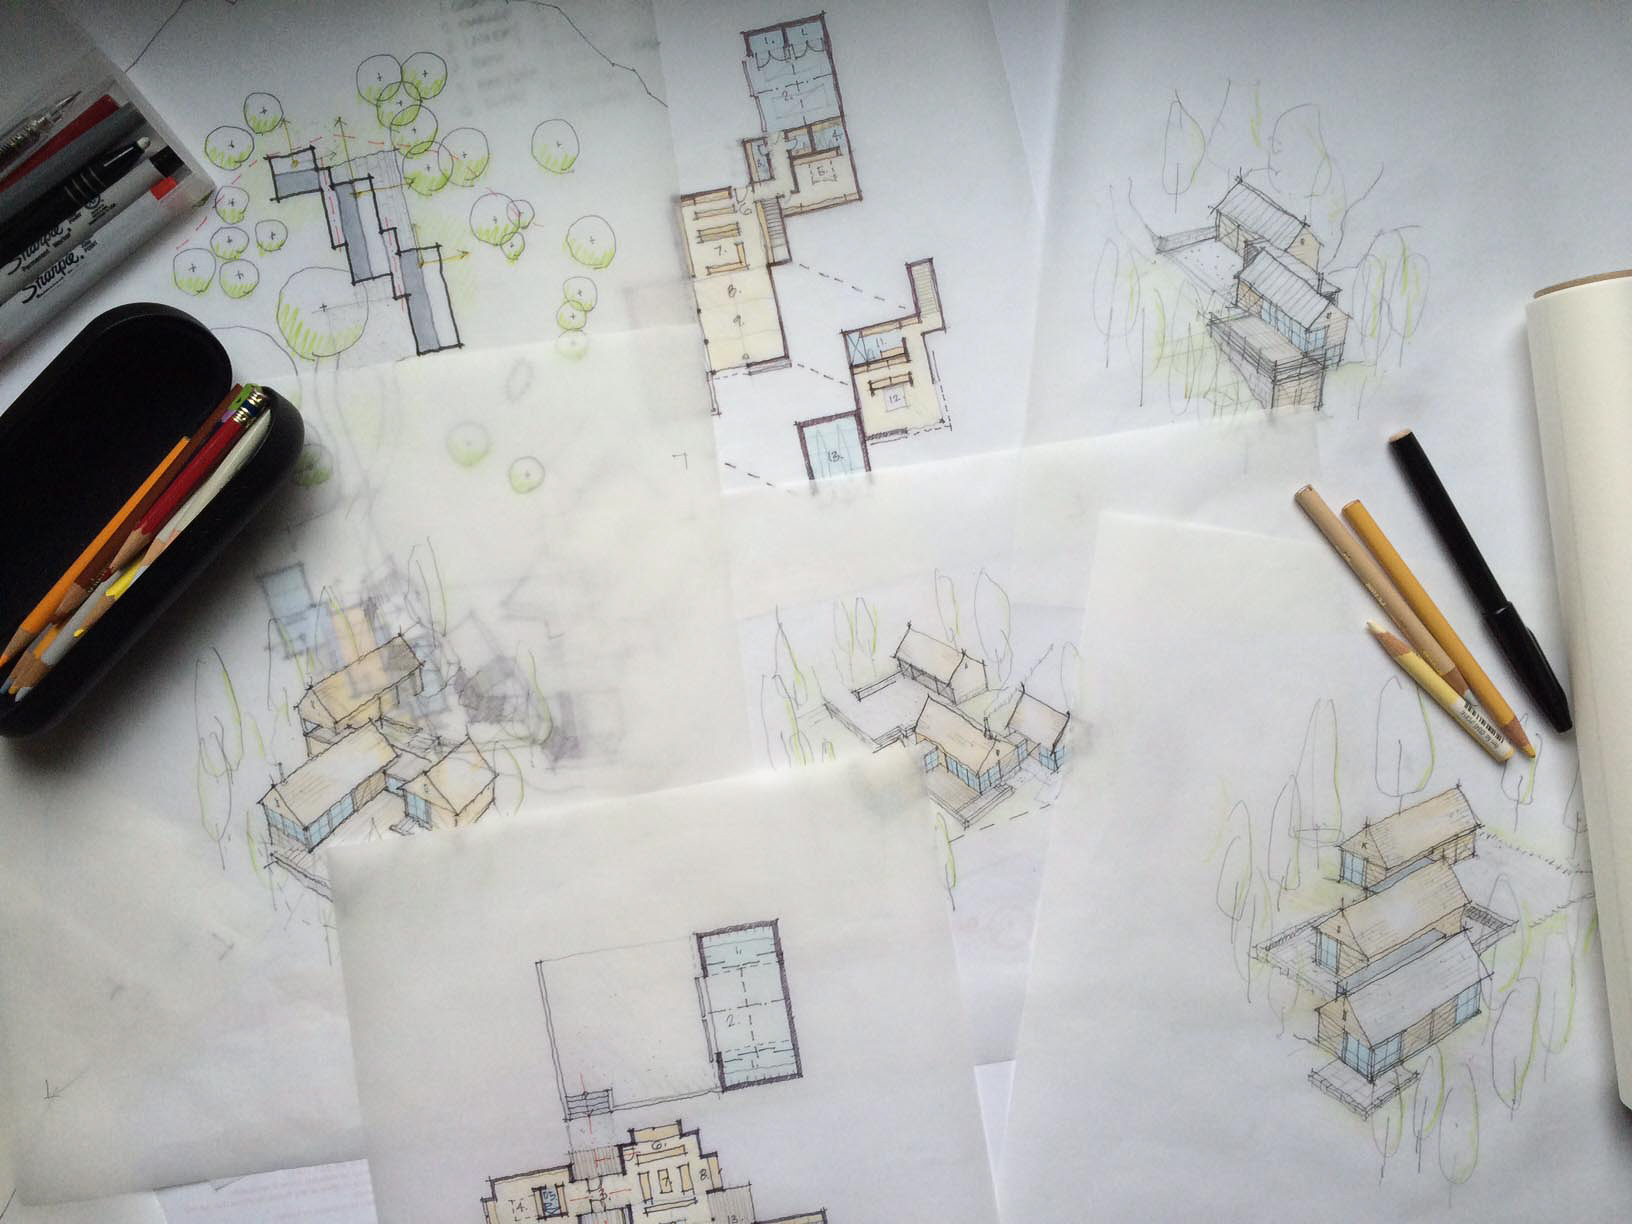 twhc-thumb-sketches.jpg